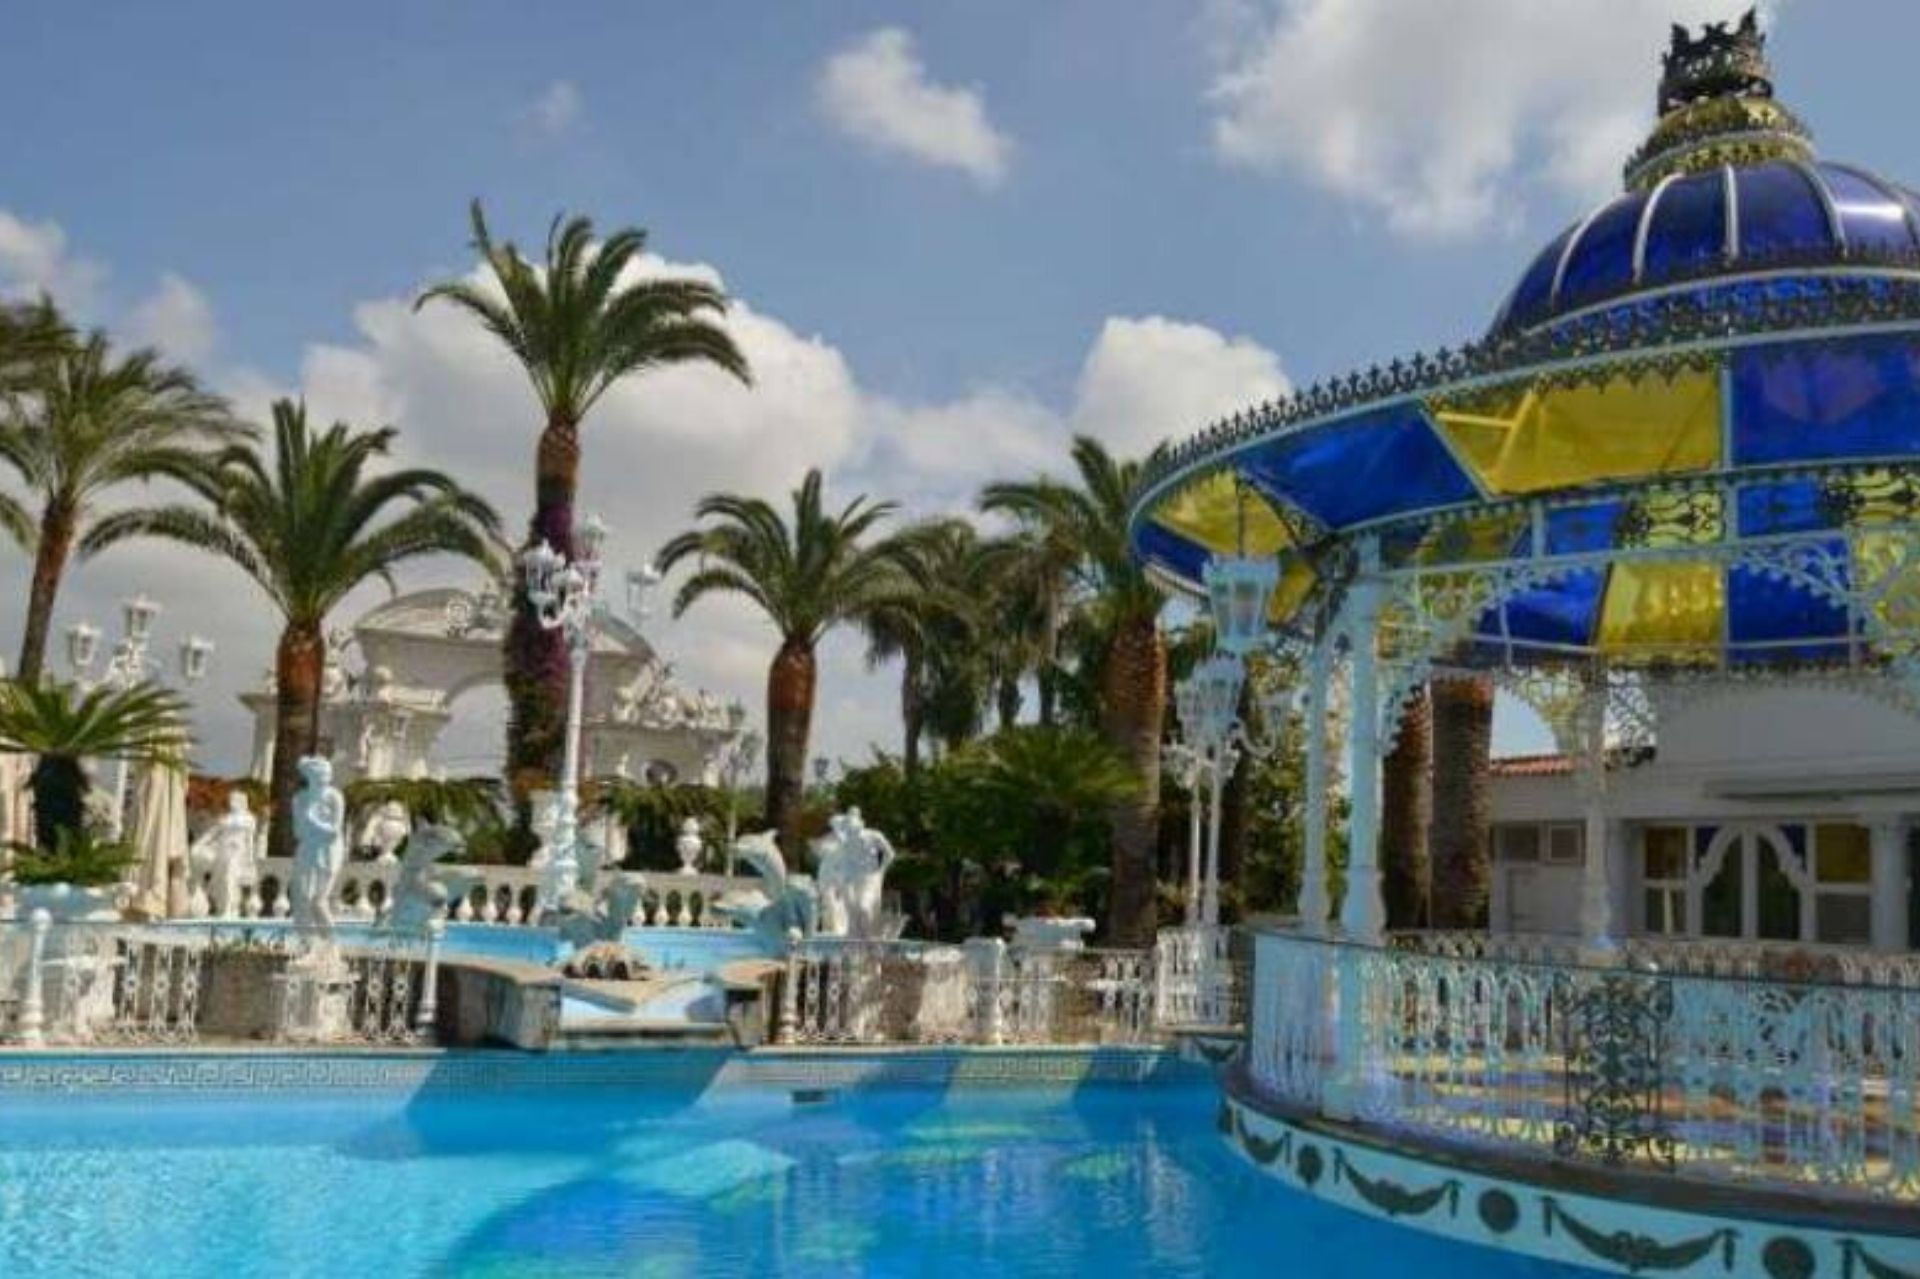 castello delle cerimonie piscina